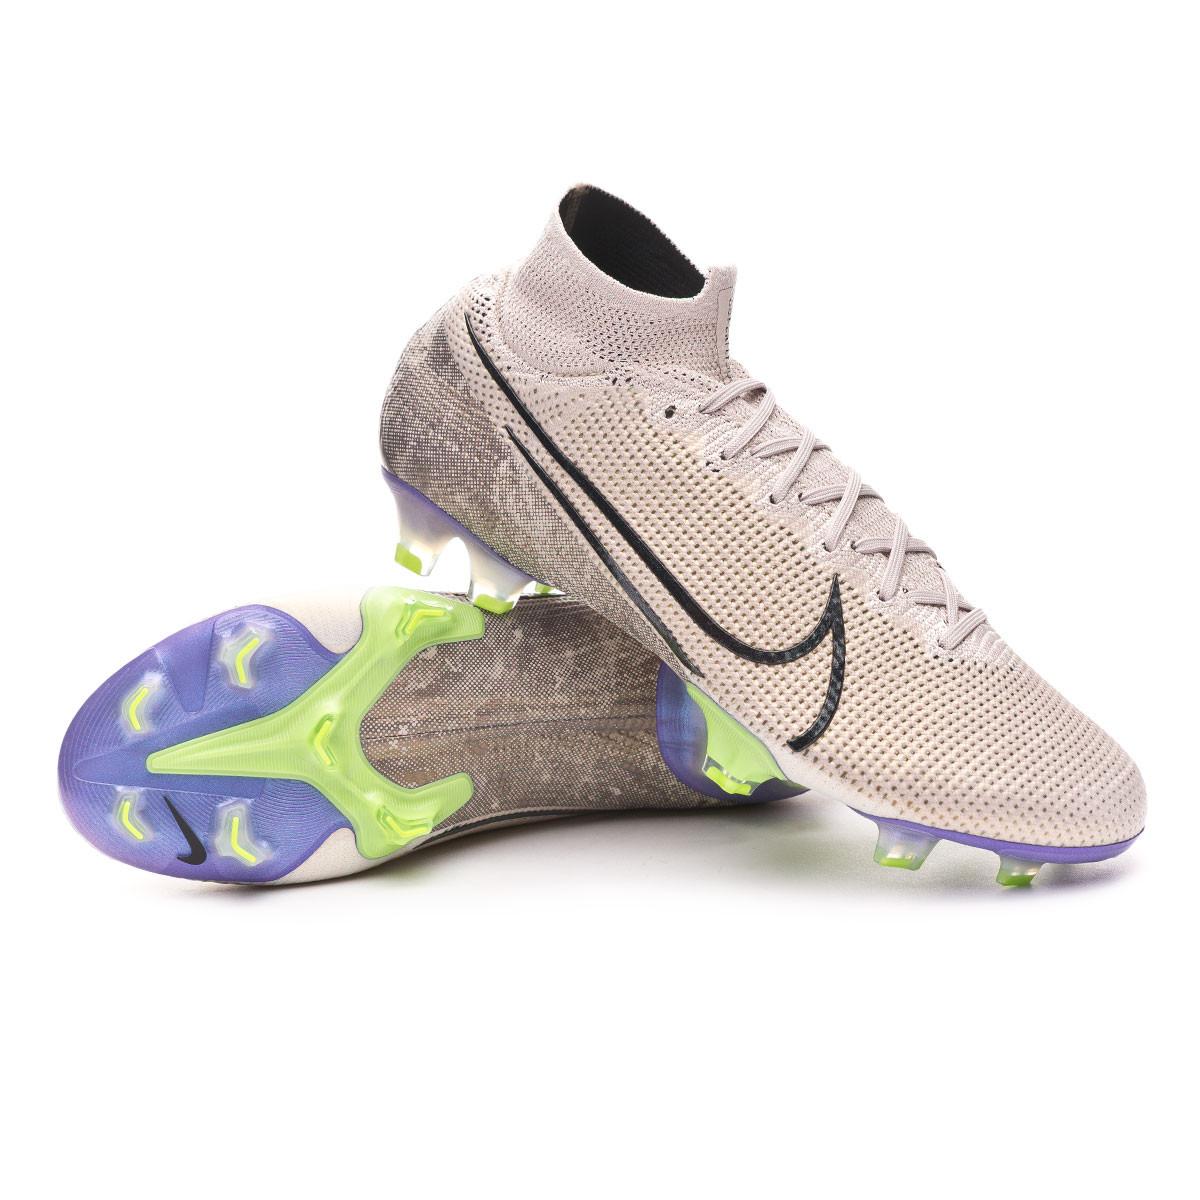 cuenta castigo Manga  Zapatos de fútbol Nike Mercurial Superfly VII Elite FG Desert  sand-Black-Psychic purple - Tienda de fútbol Fútbol Emotion